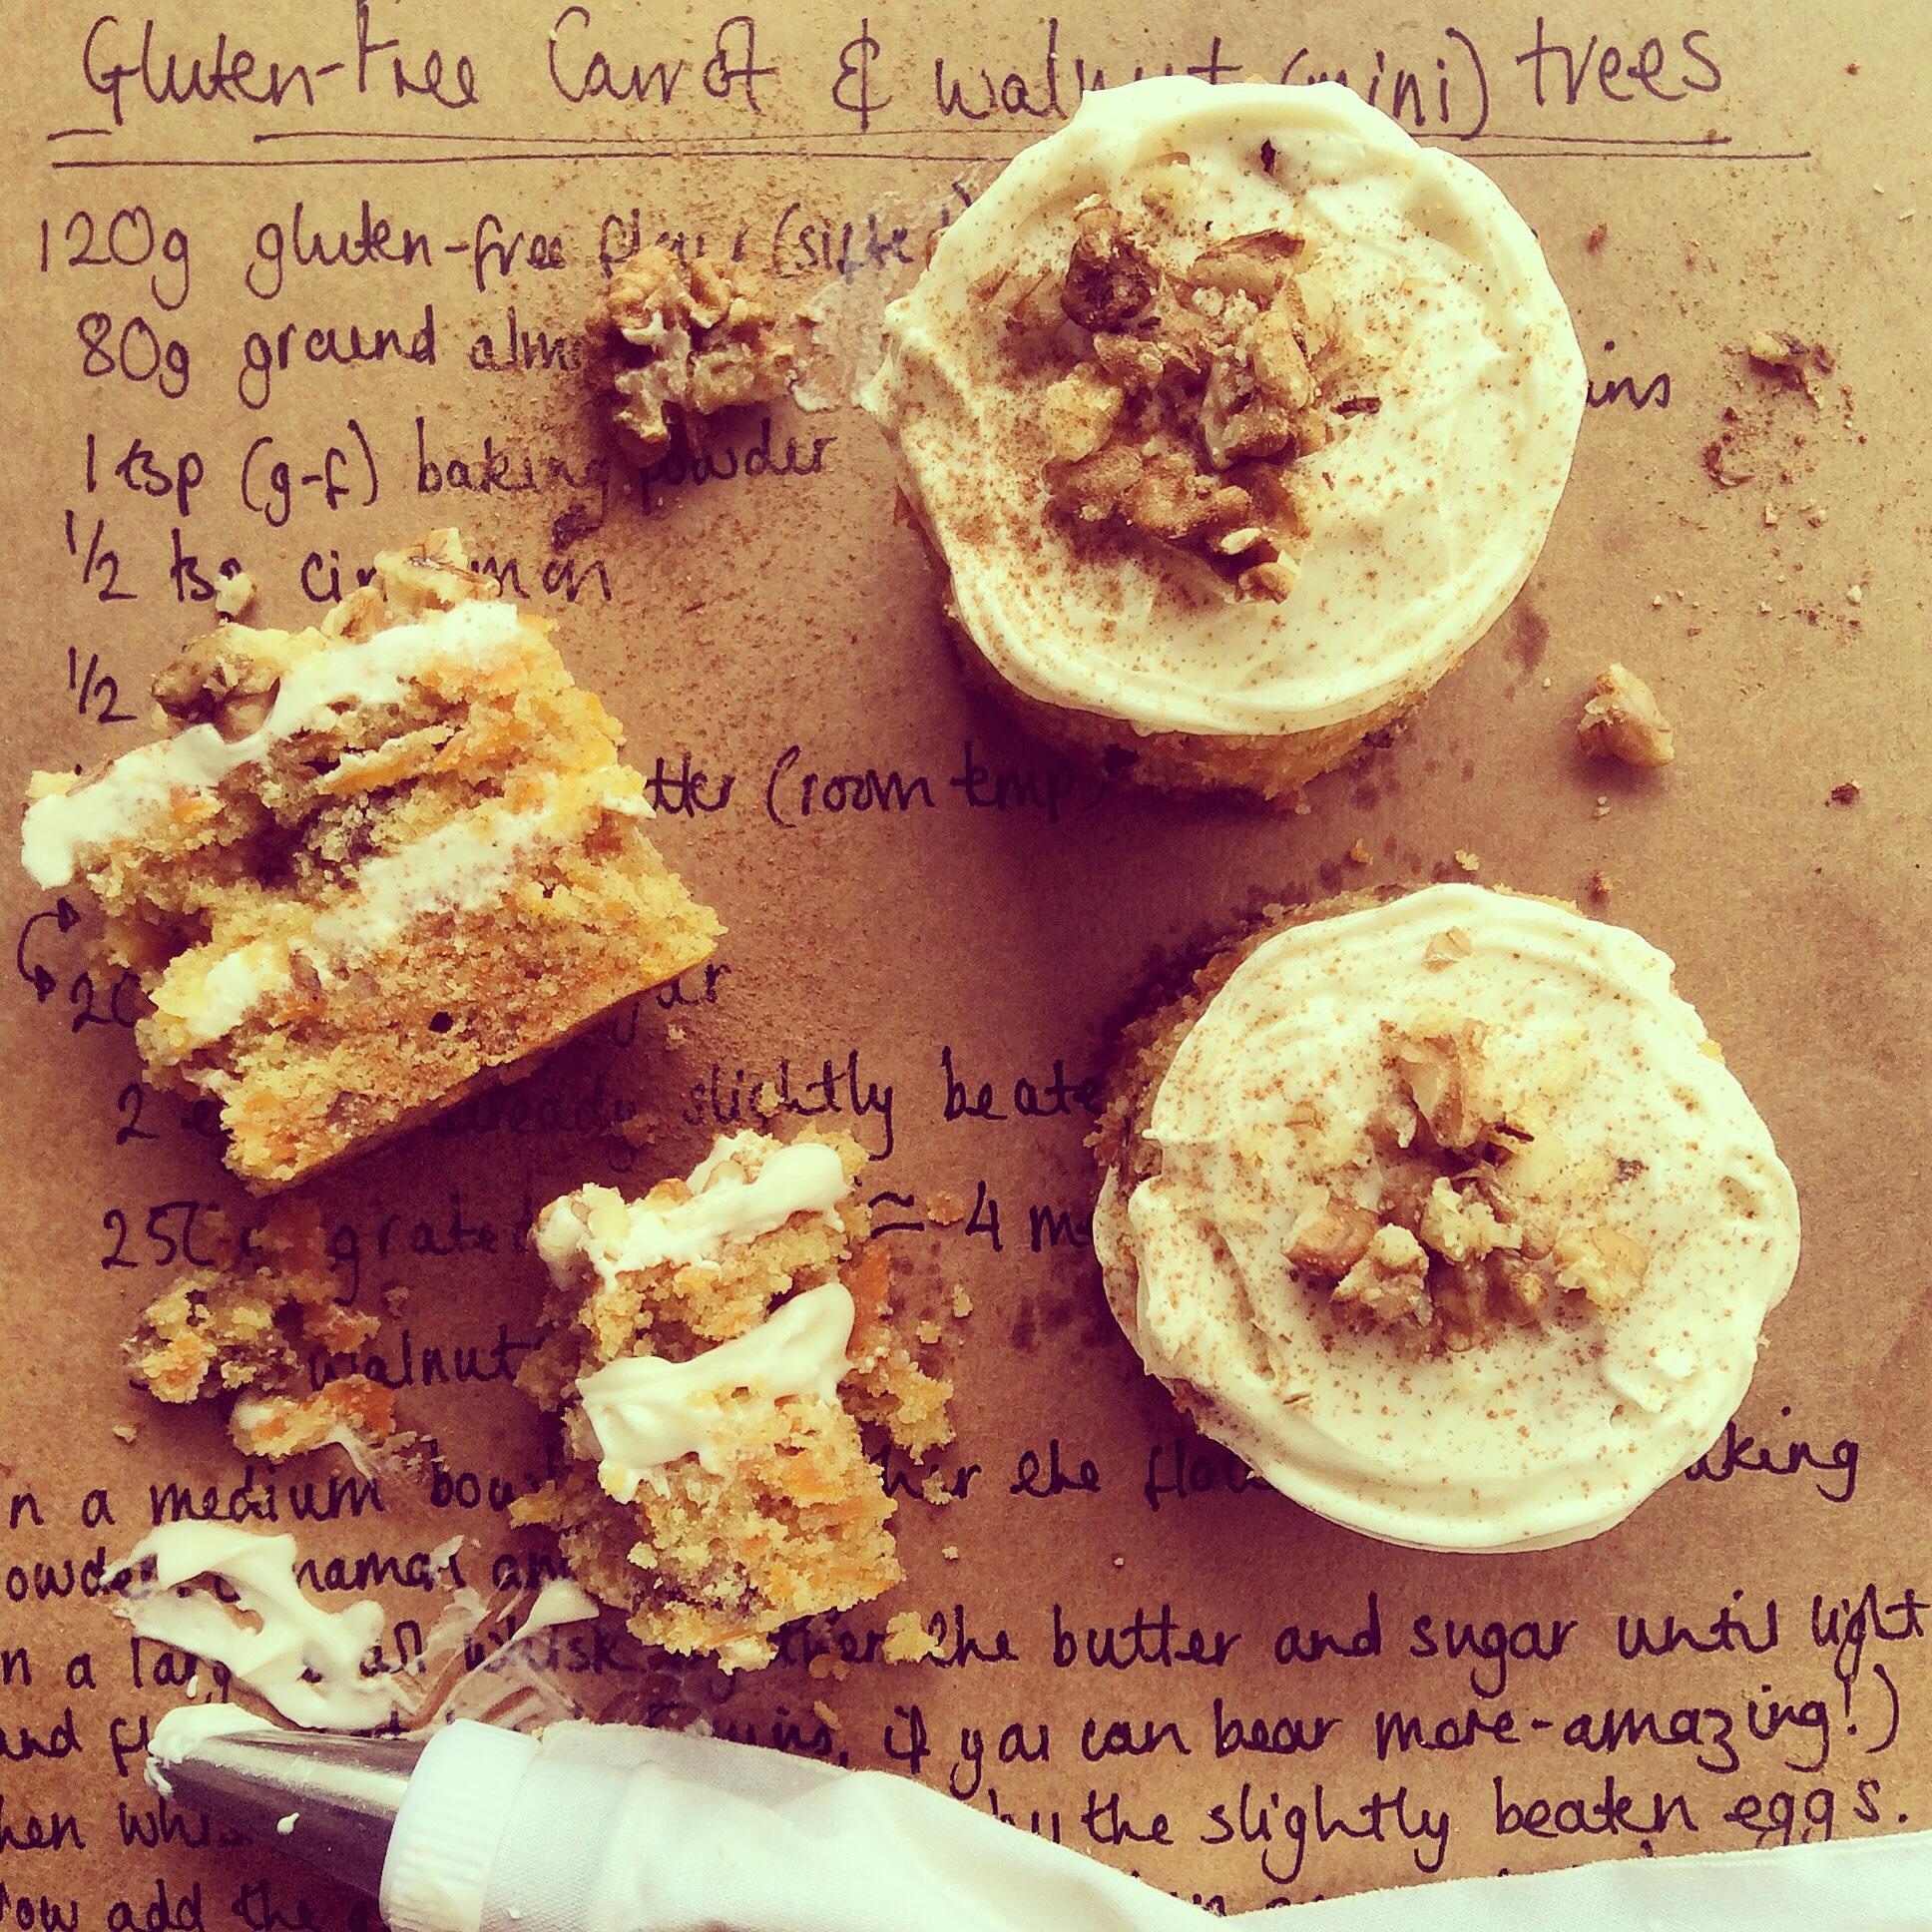 Gluten Free Carrot & Walnut Trees